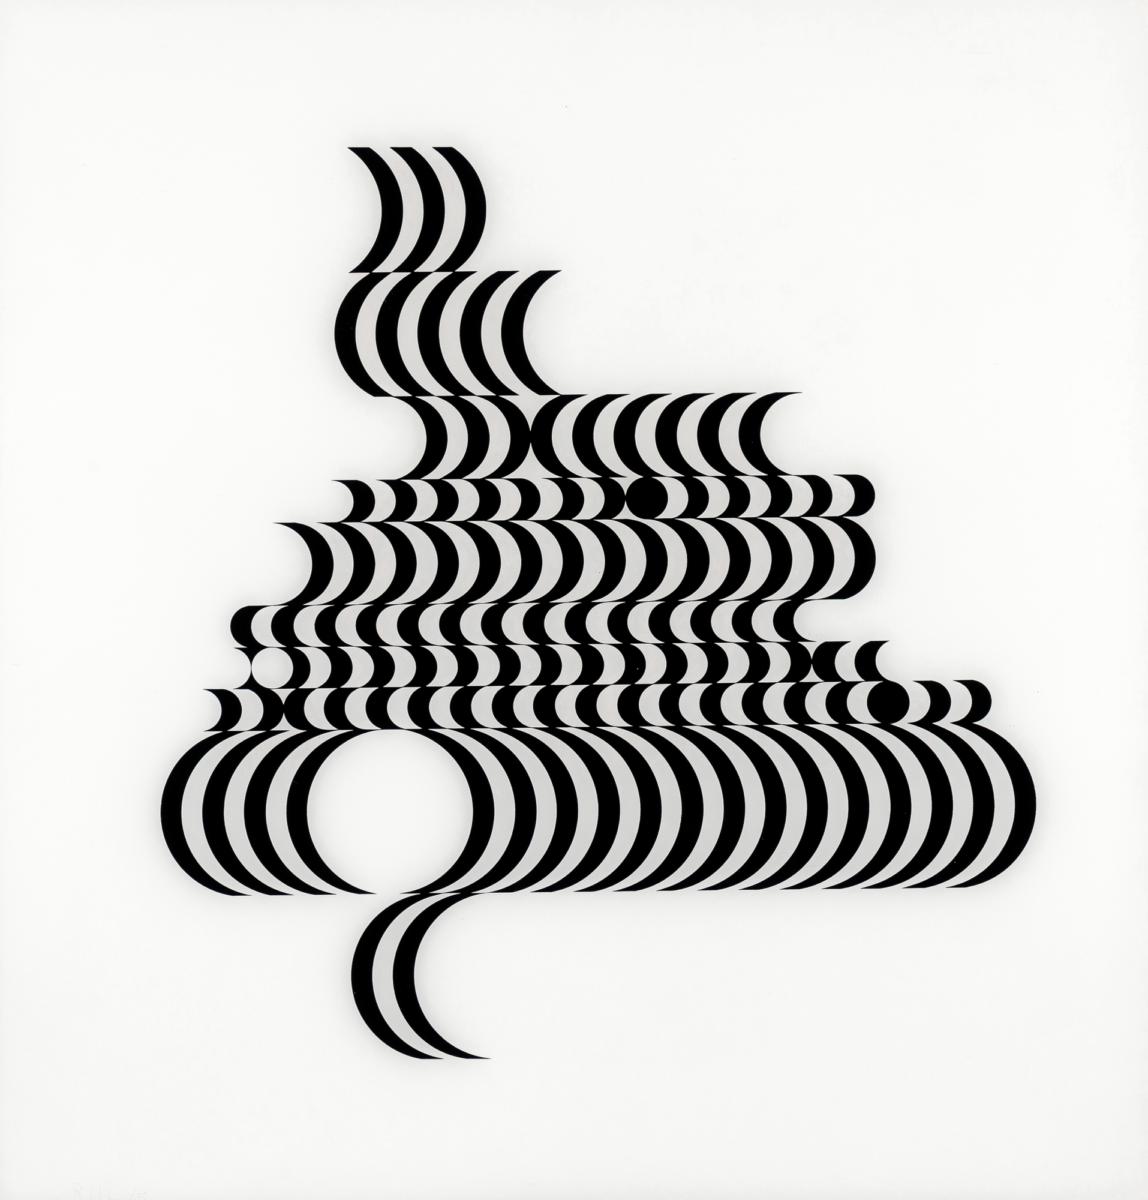 Bridget Riley Untitled [Fragment 2] black and white screenprint on plexiglas for sale